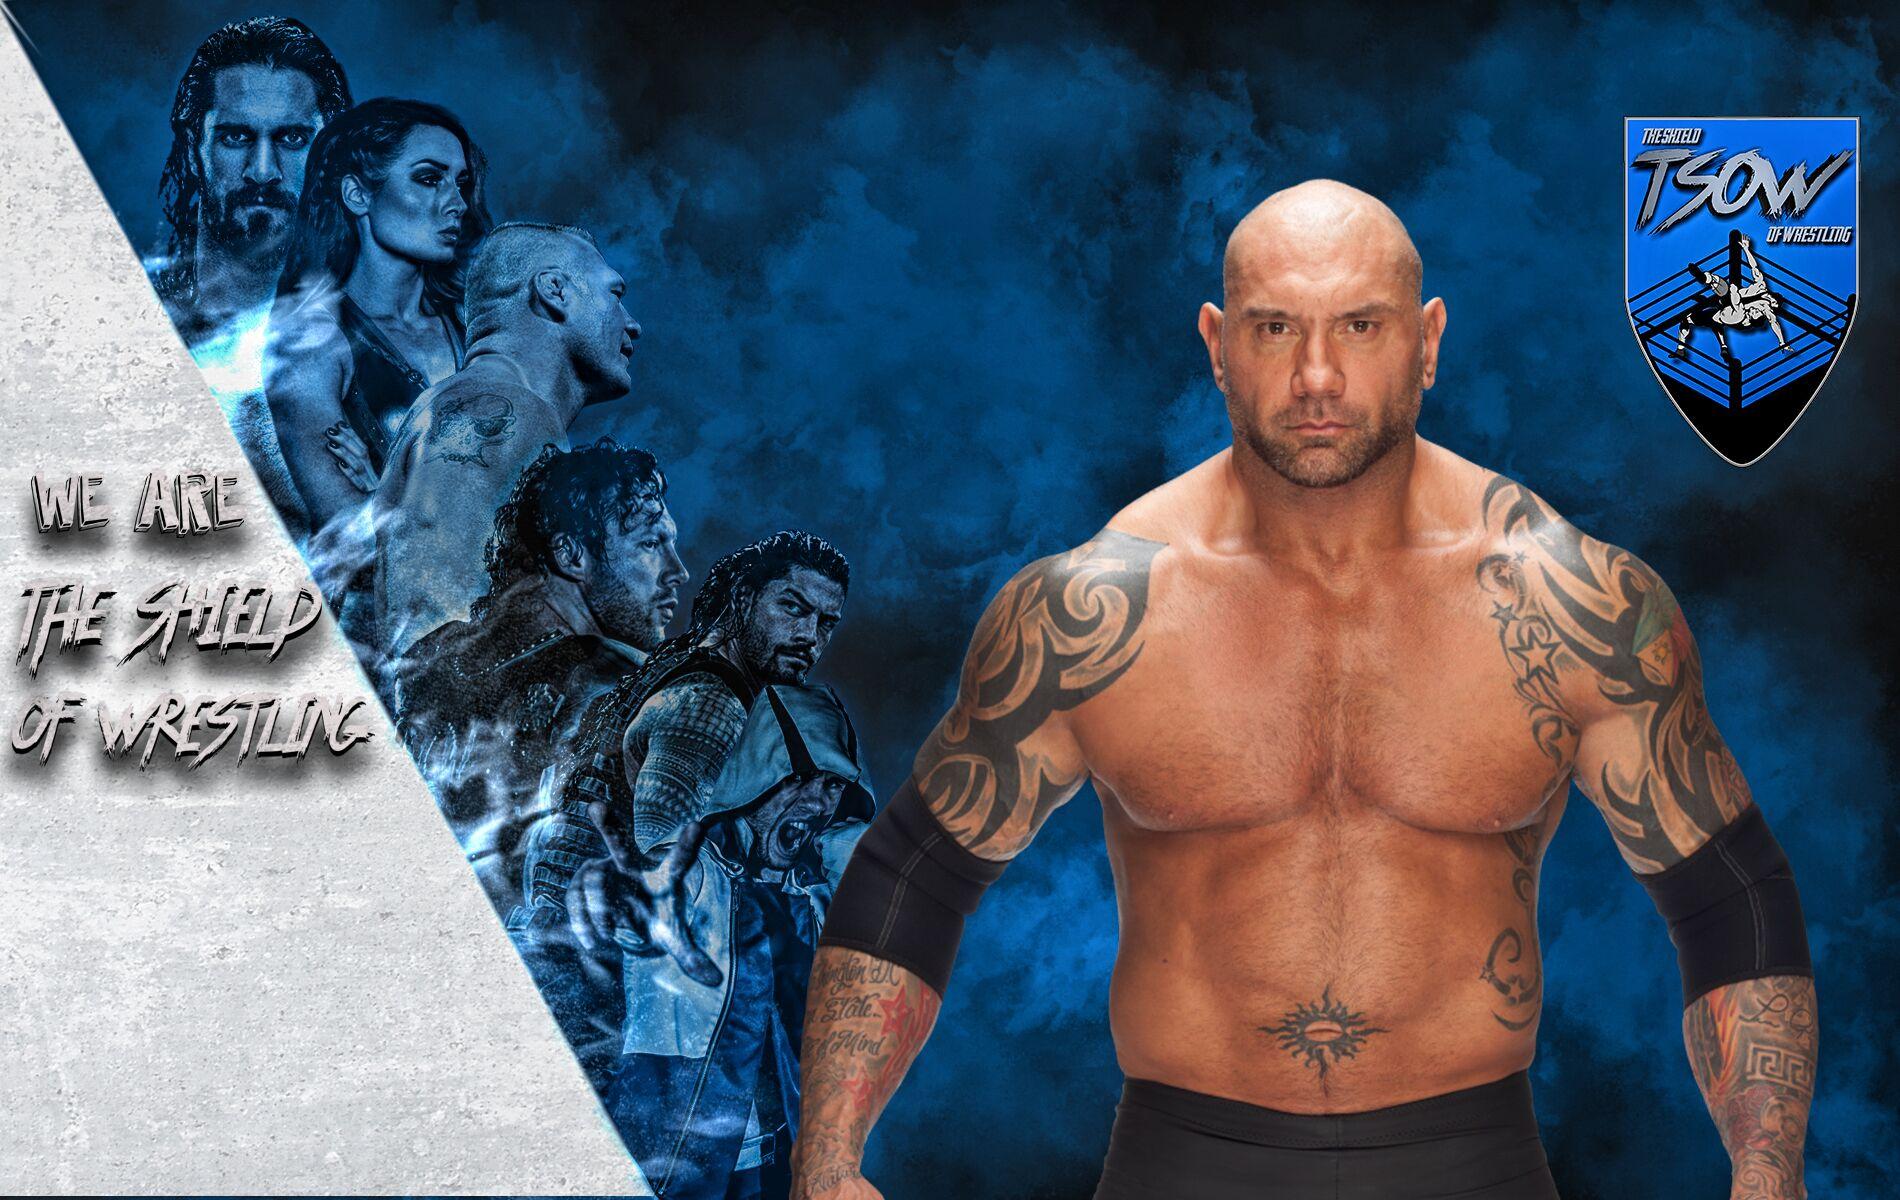 Wrestler di IMPACT sfida Batista - Killer Kross